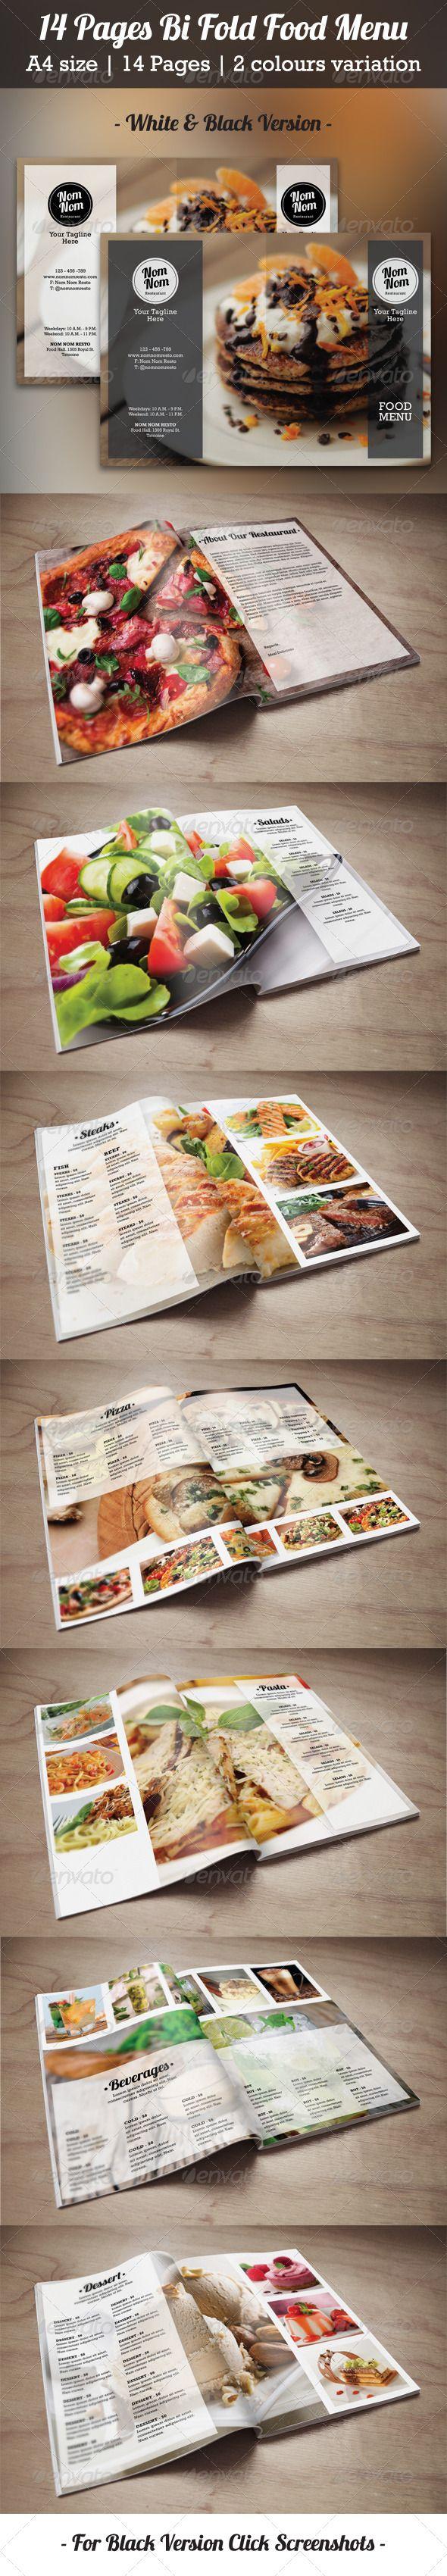 14 Pages Bi Fold Food Menu Template #design #speisekarte Download: http://graphicriver.net/item/14-pages-bi-fold-food-menu/8101125?ref=ksioks